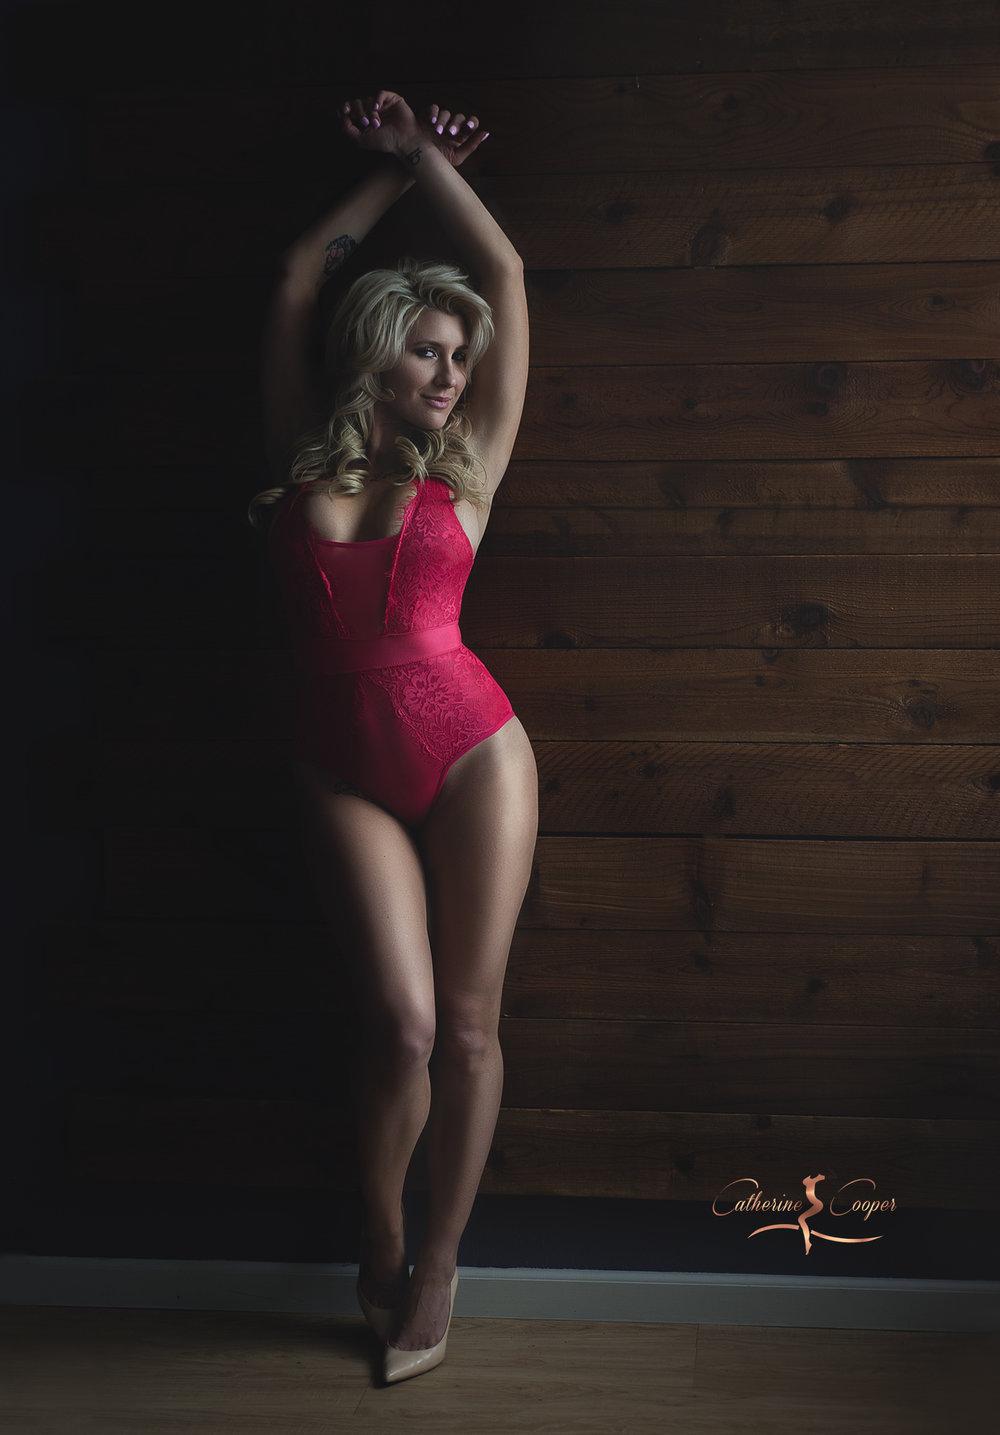 standing-on-a-wall-boudoir-msa4.jpg